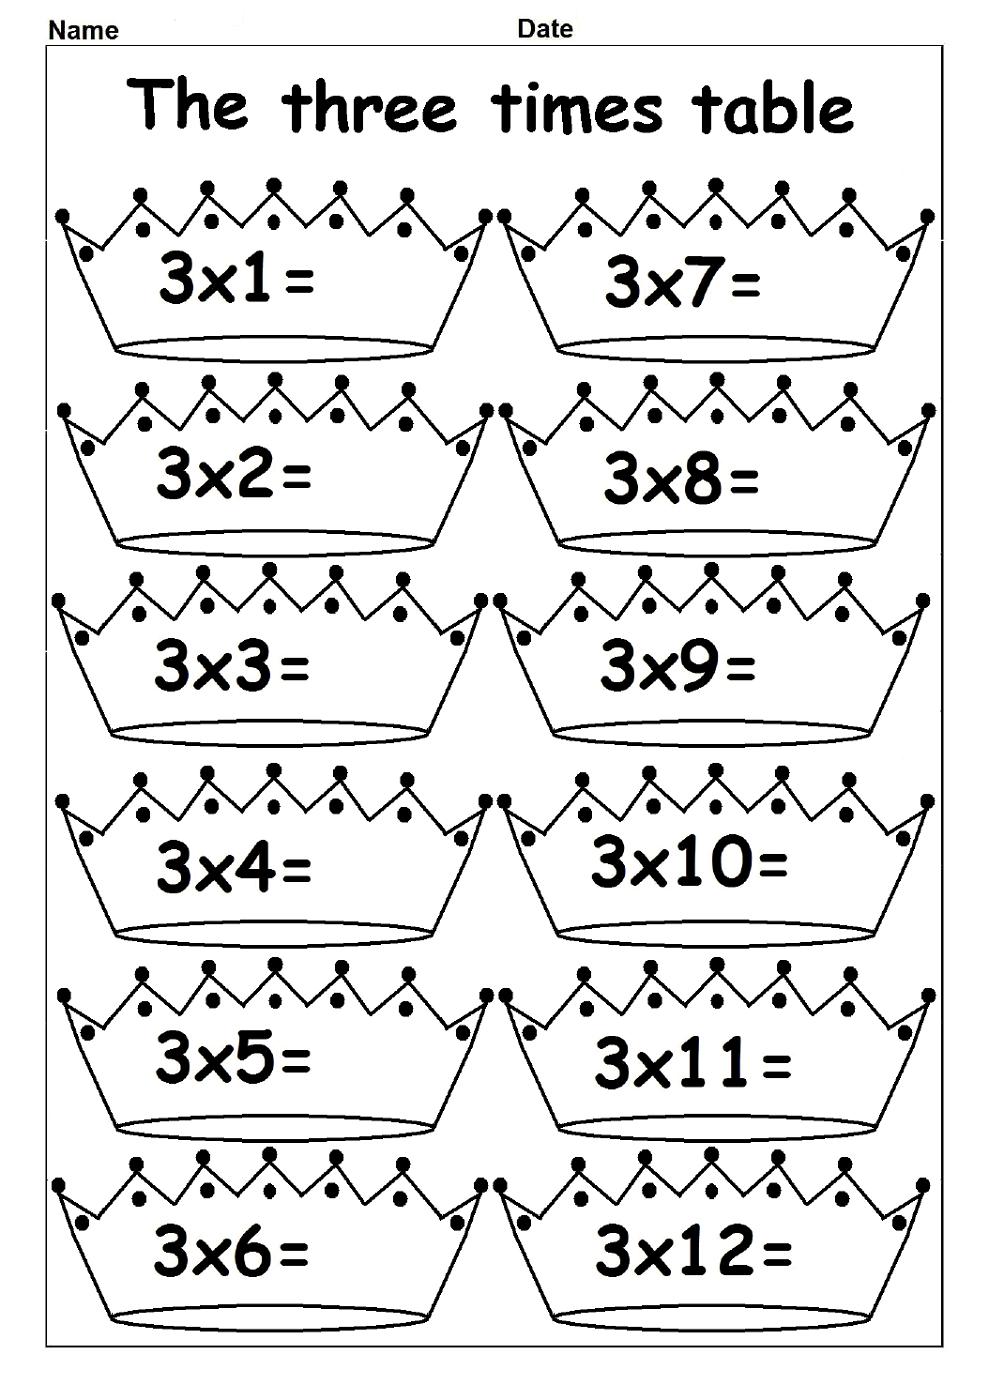 Printable 3 Times Table Chart Times Tables Worksheets Multiplication Times Tables Multiplication